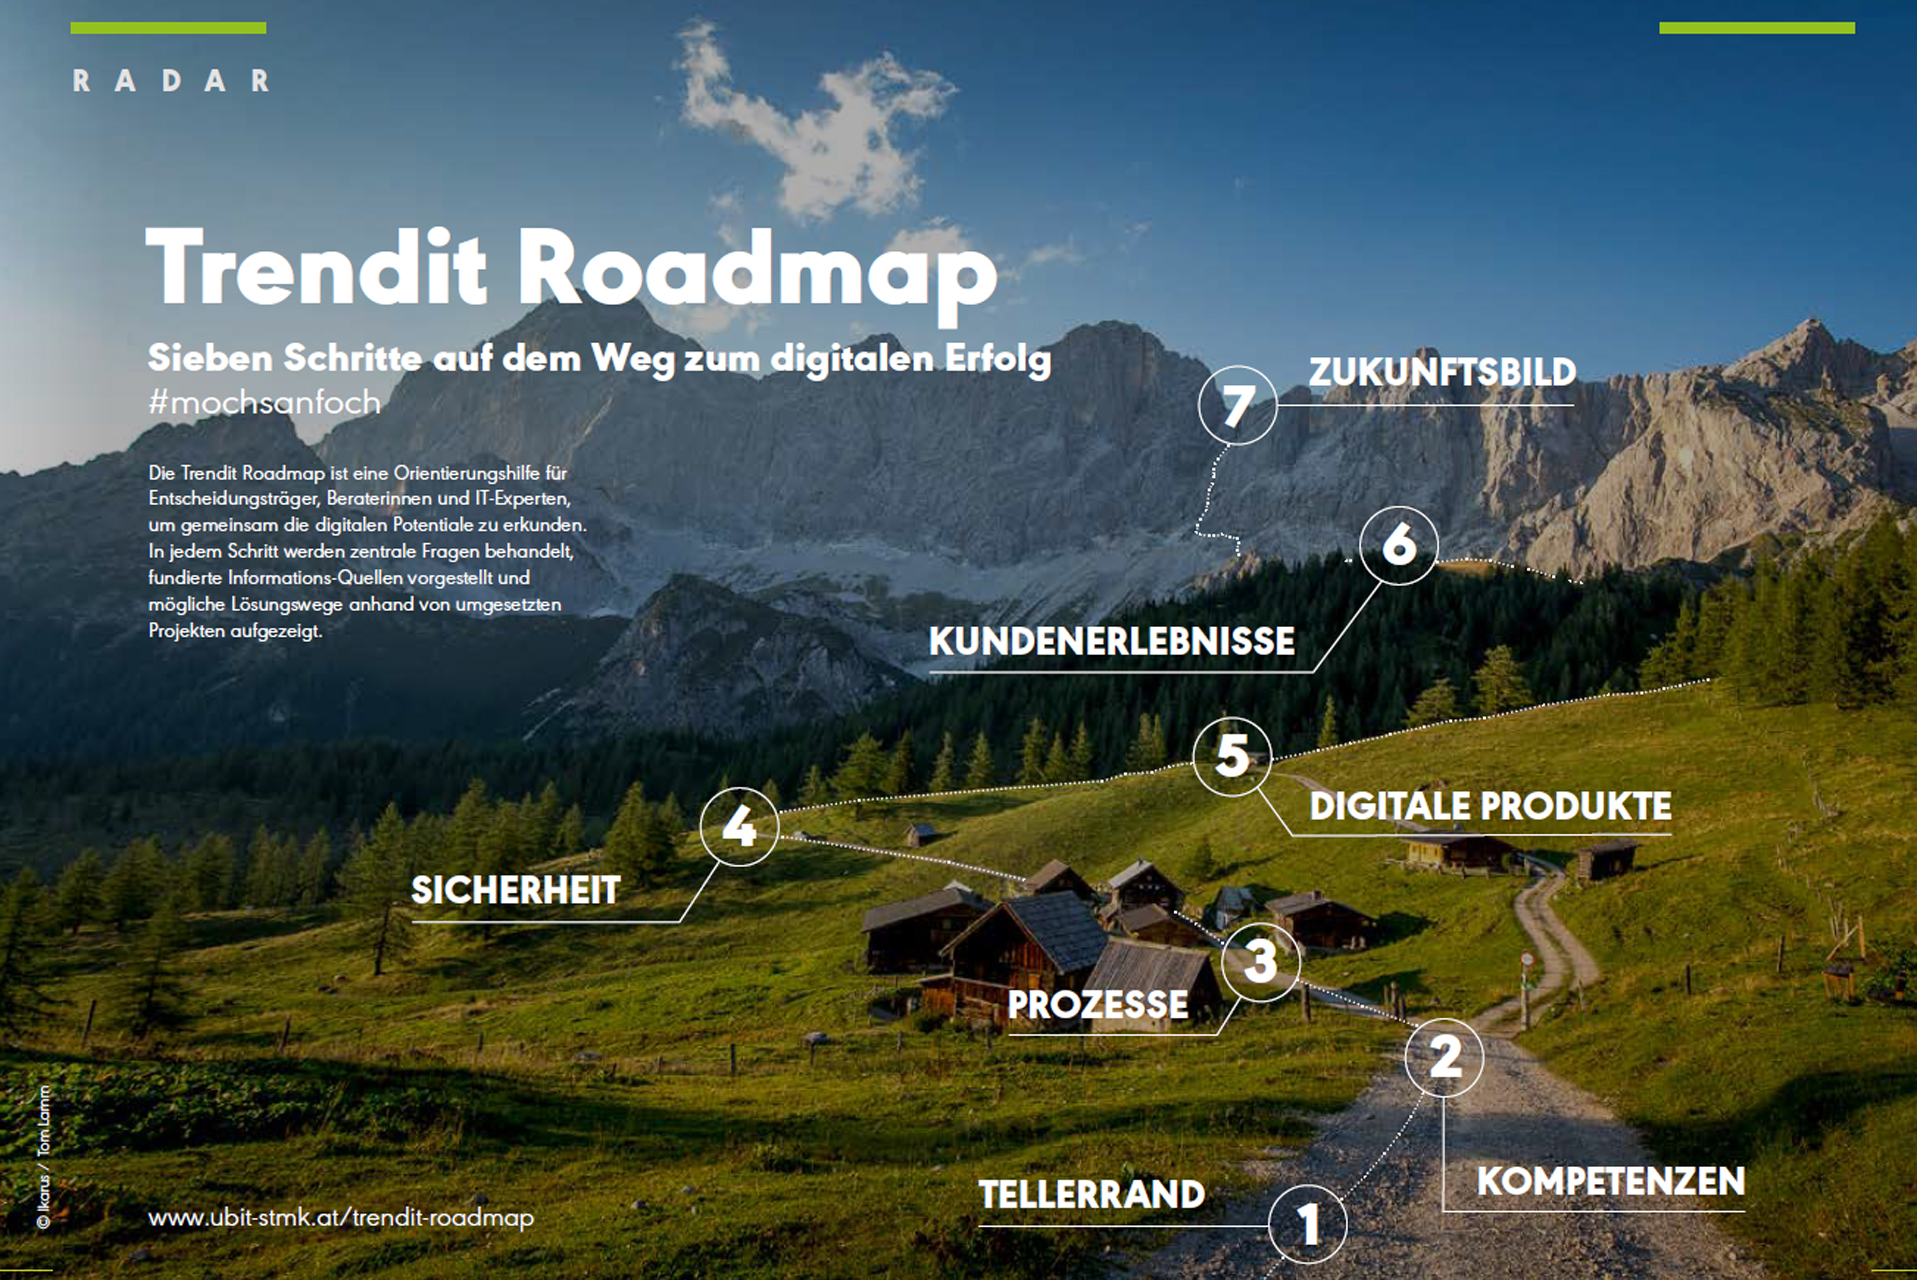 Trendit_Roadmap_UBIT_STMK